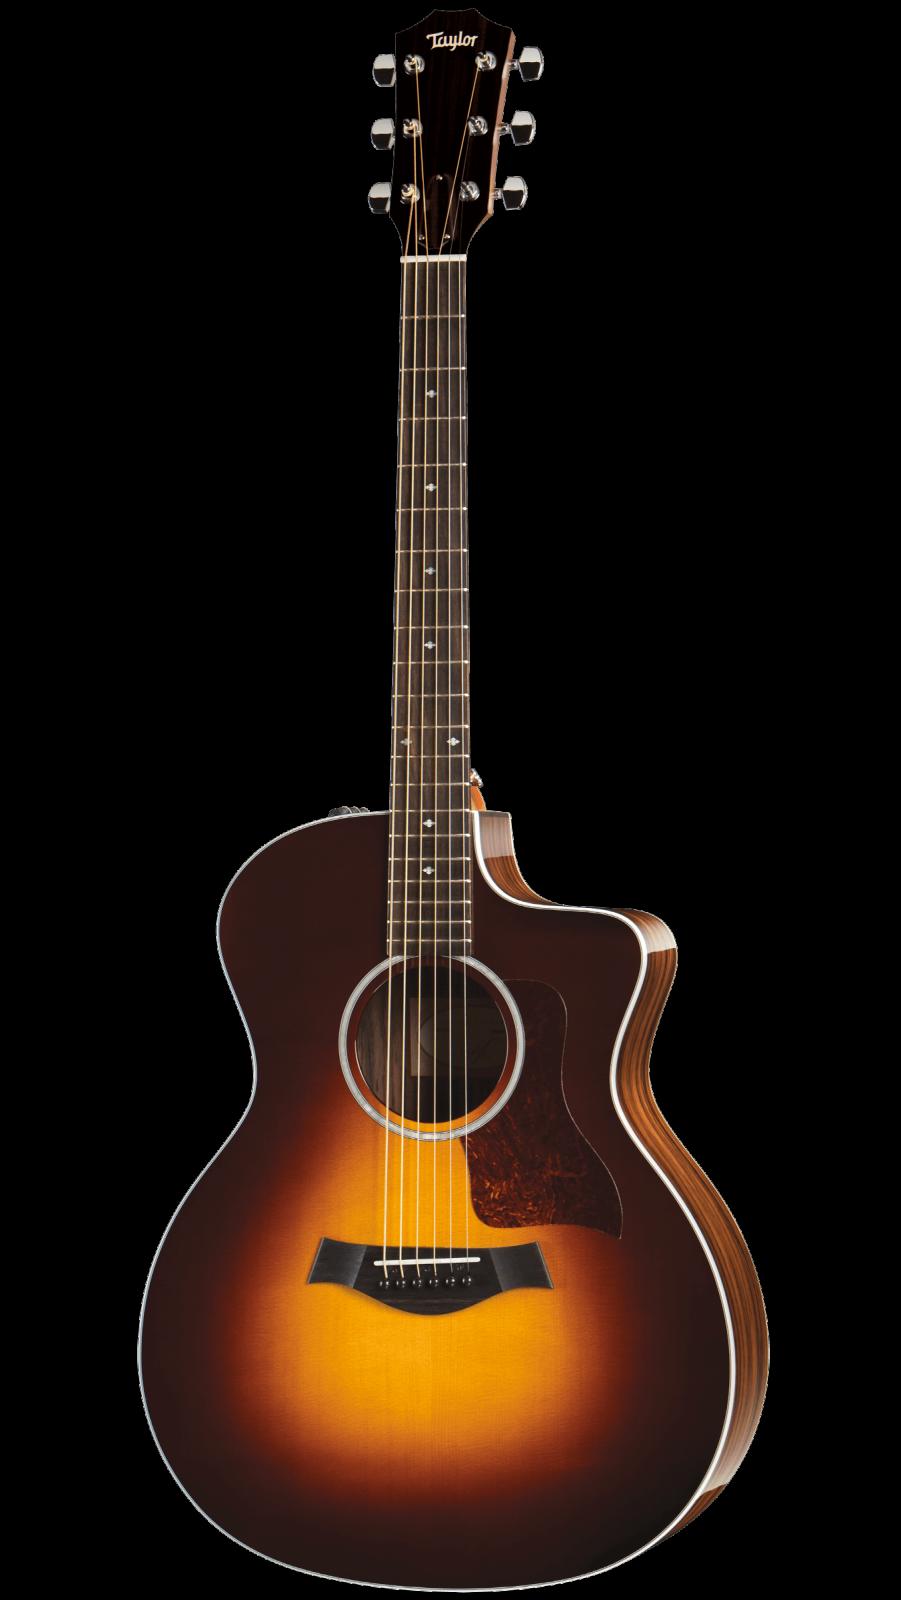 Taylor 214ce DLX - SB Deluxe